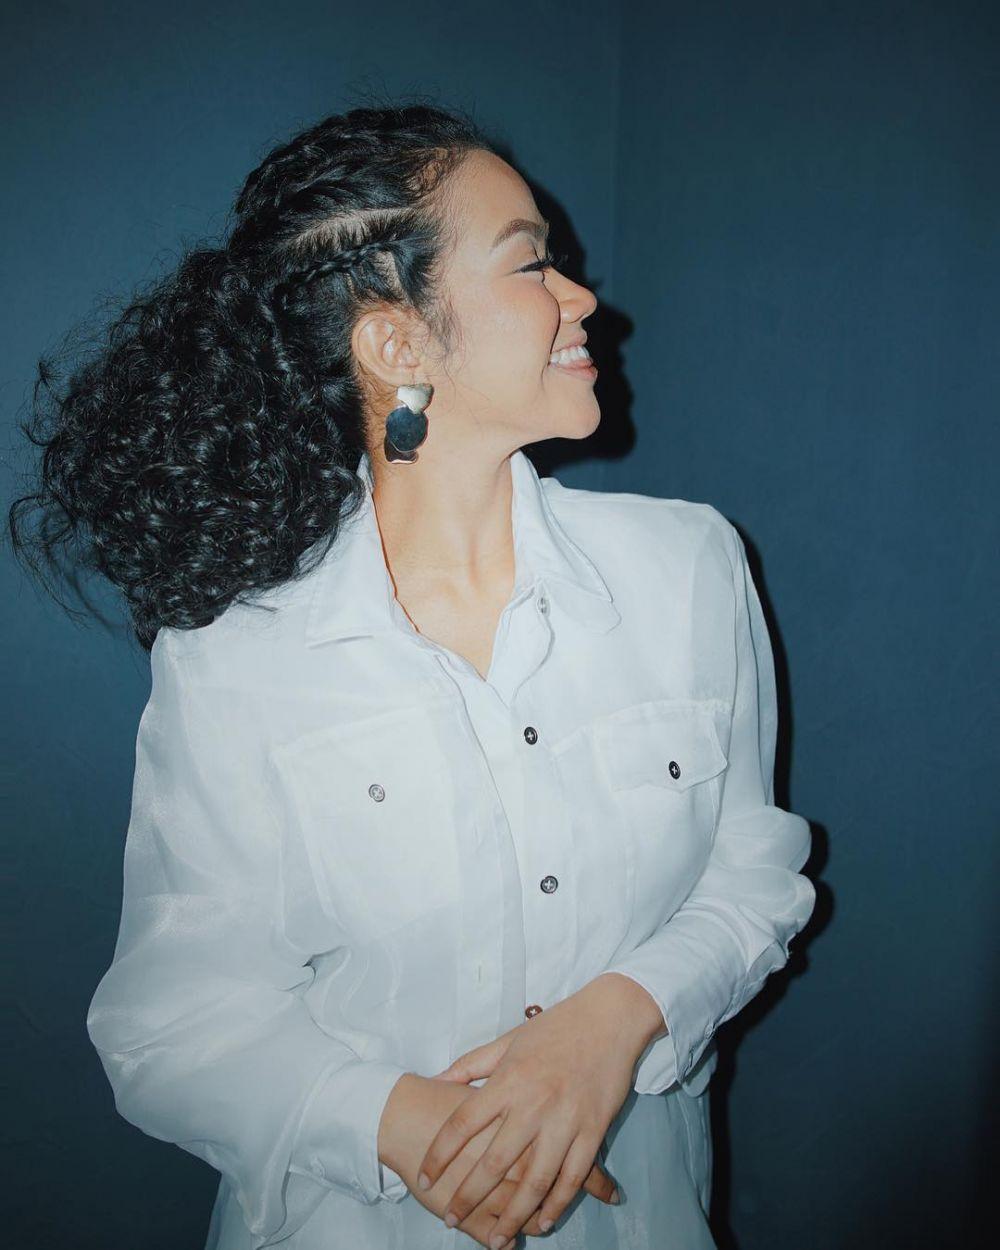 penyanyi wanita dengan rambut cornrows © 2020 brilio.net